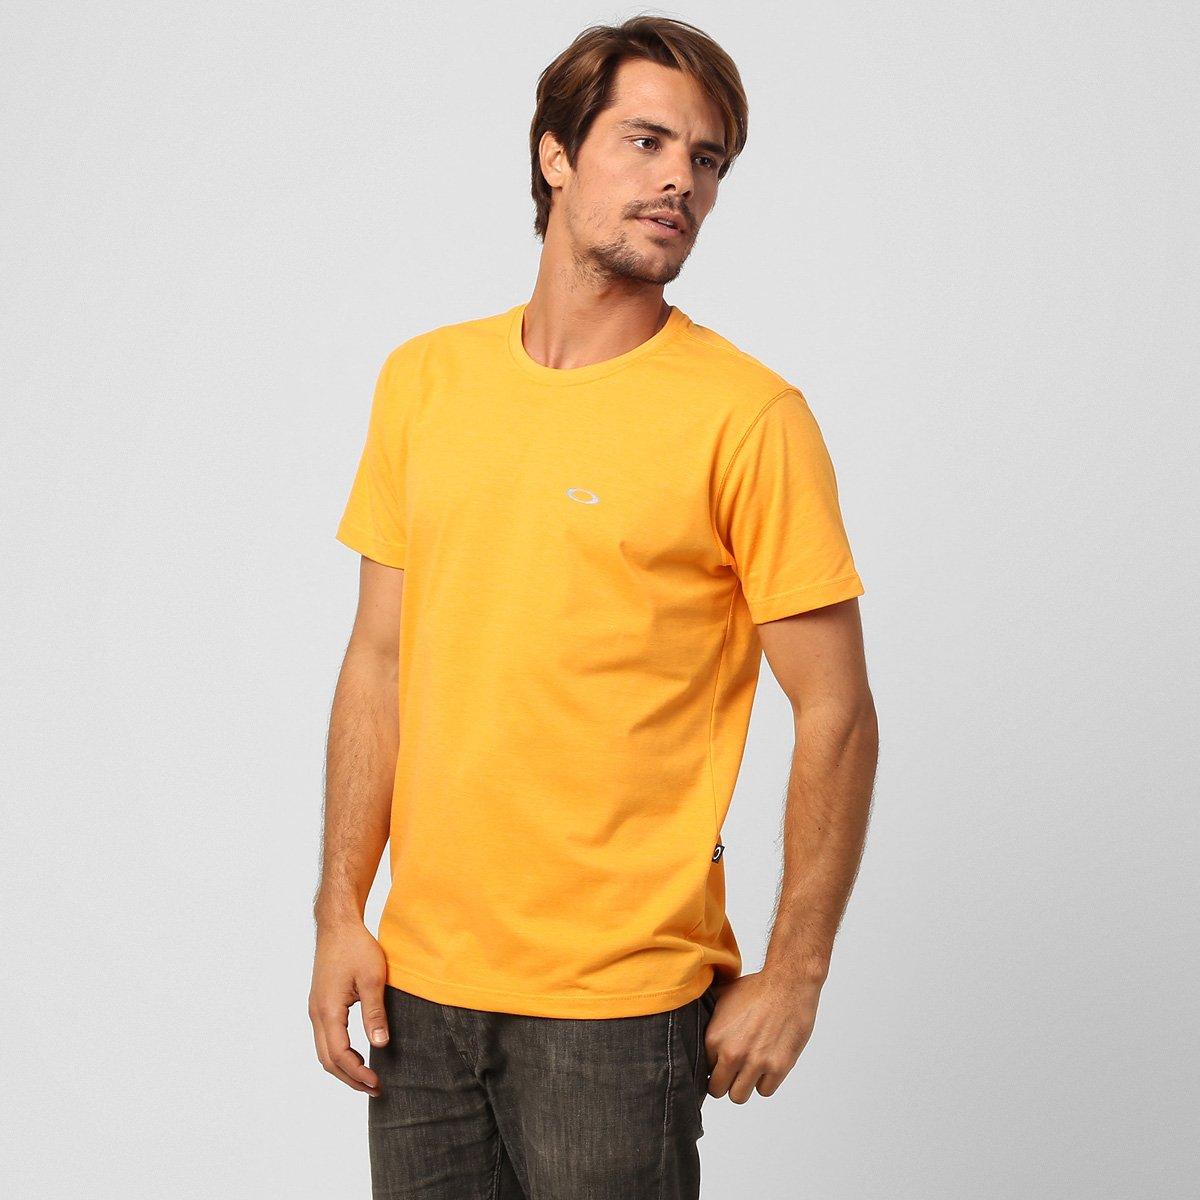 Camiseta Oakley Dry Masculina - Laranja Claro - Compre Agora  0e537b8b50b